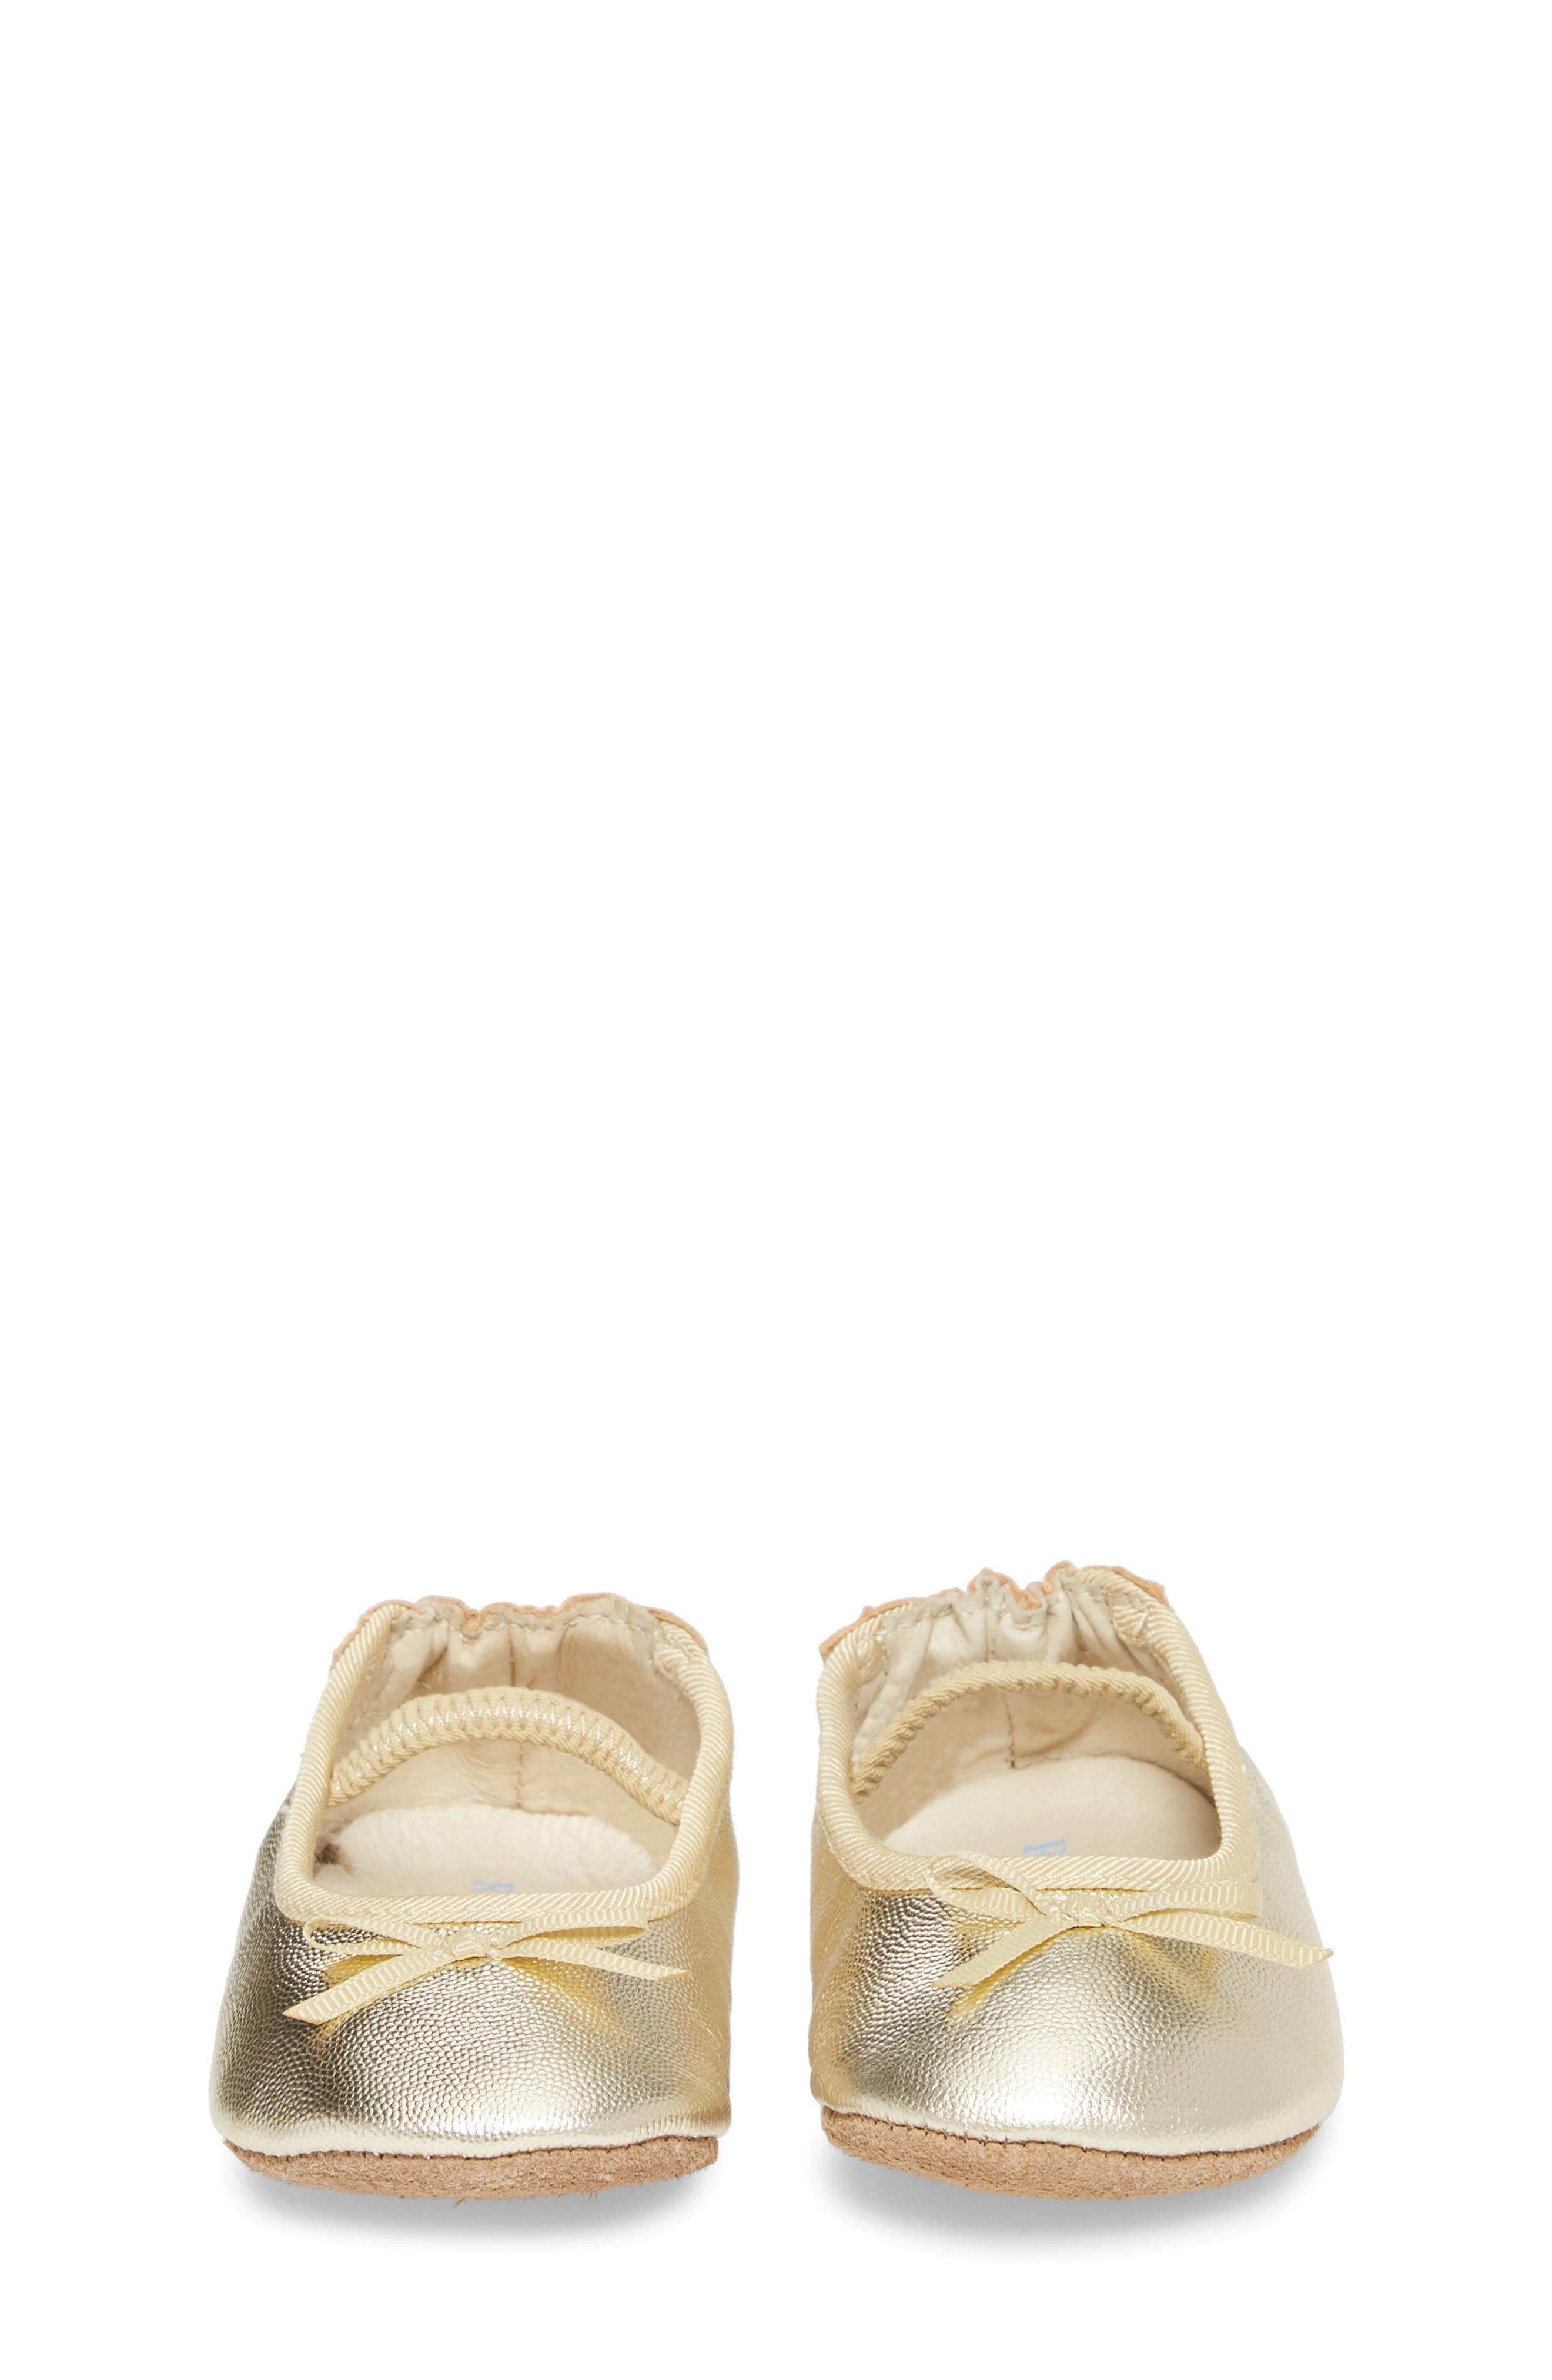 ROBEEZ<SUP>®</SUP>, Athena Ballet Strap Crib Shoe, Alternate thumbnail 4, color, GOLD